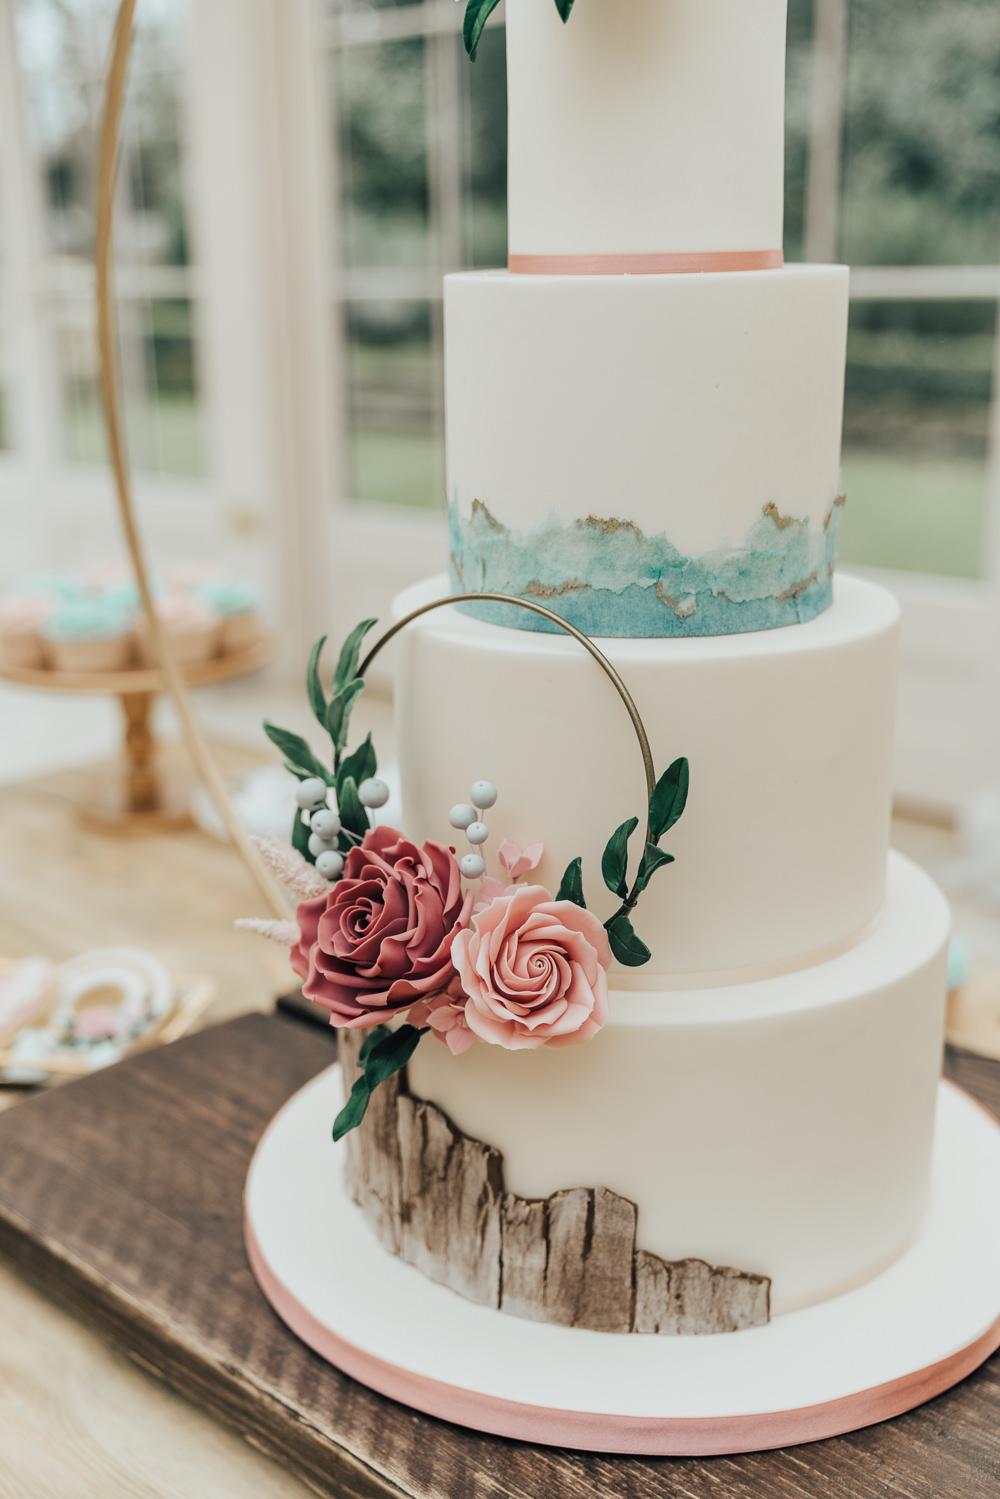 Cake Wreath Floral Flowers Wood Brush Stokes Hoop Wedding Ideas Rebecca Carpenter Photography